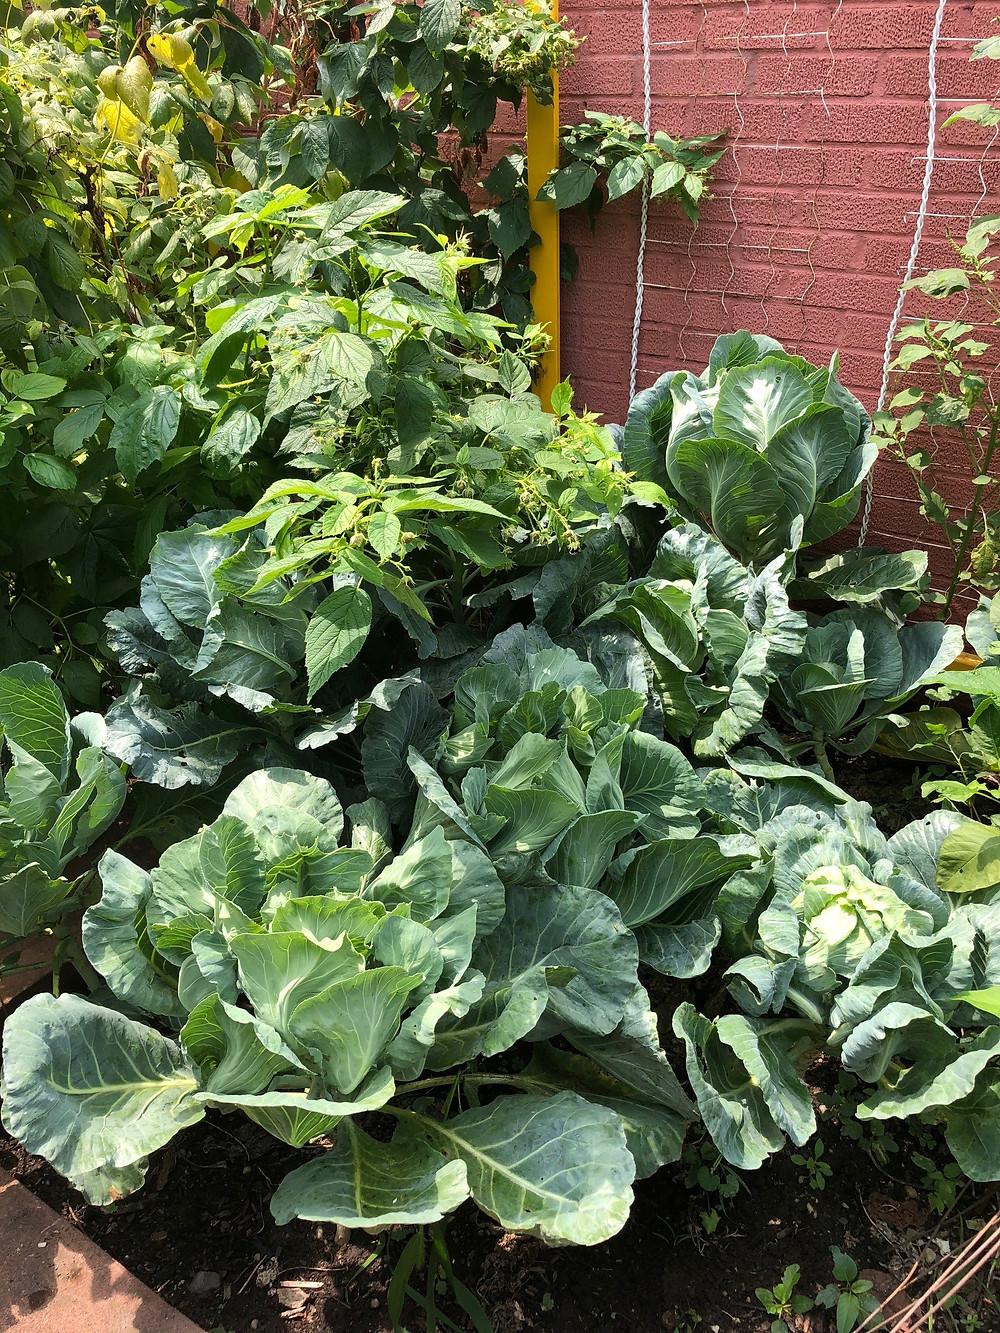 A VERY Green Block in Brooklyn. Photo courtesy of The Brooklyn Botanic Garden.